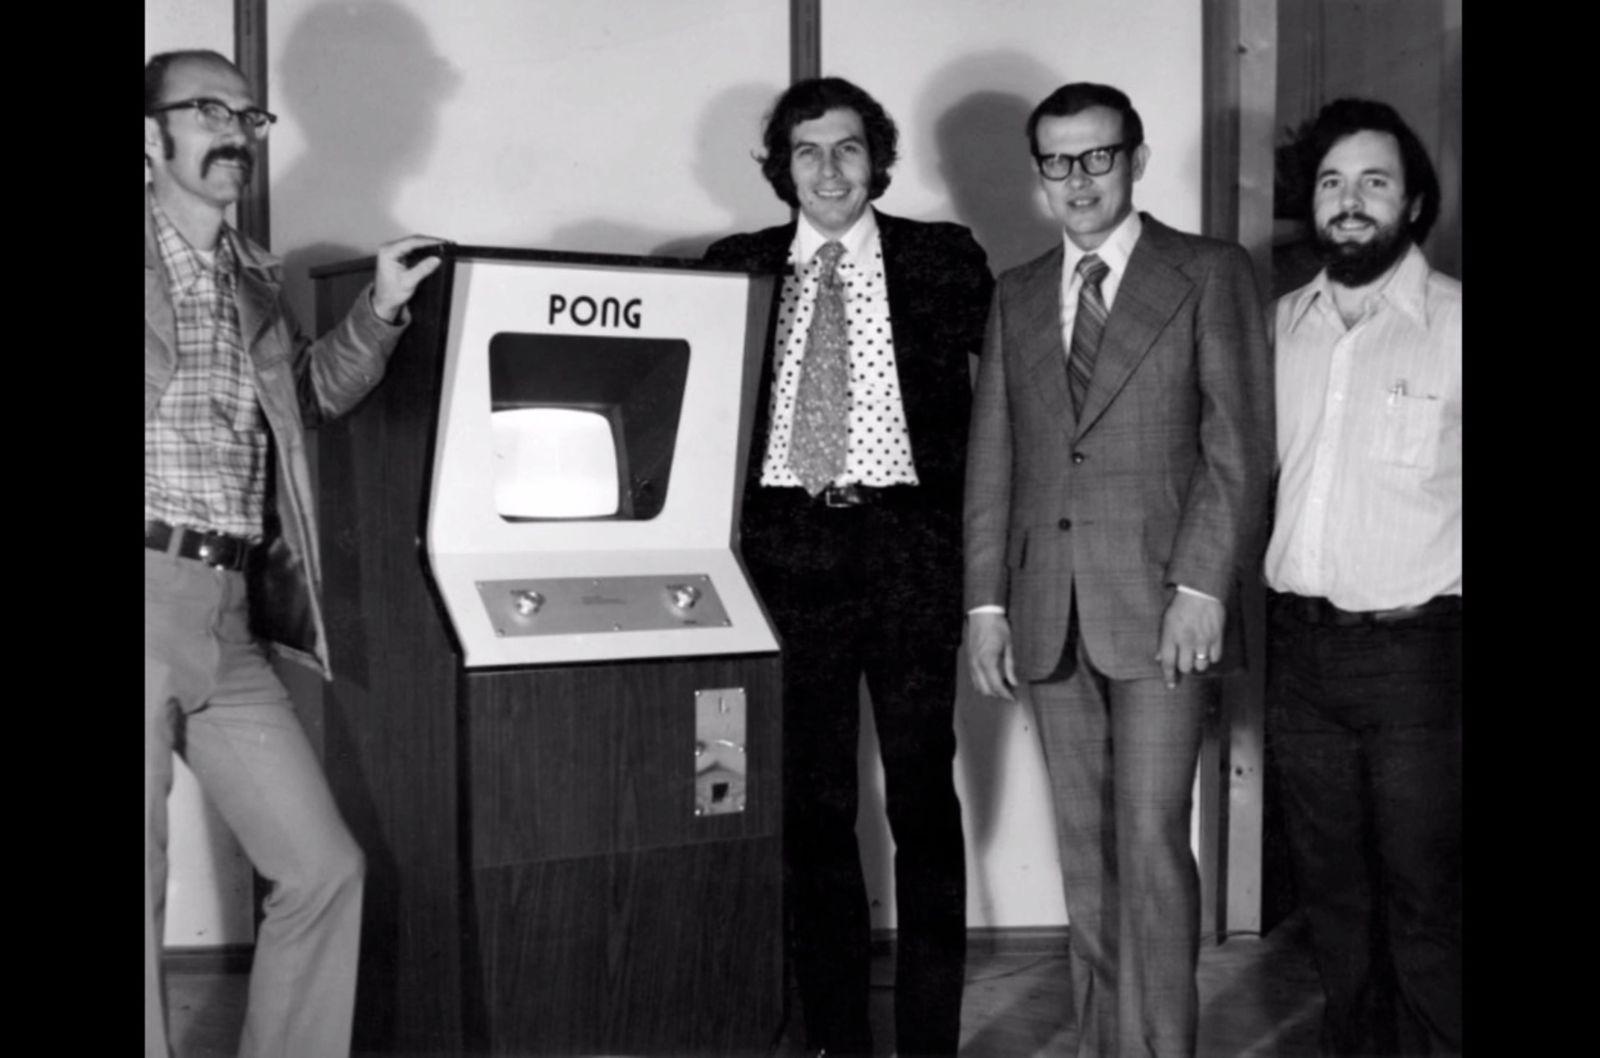 NUR ALS ZITAT Screenshot YouTube/ Atari/ Pong/ Ted Dabney